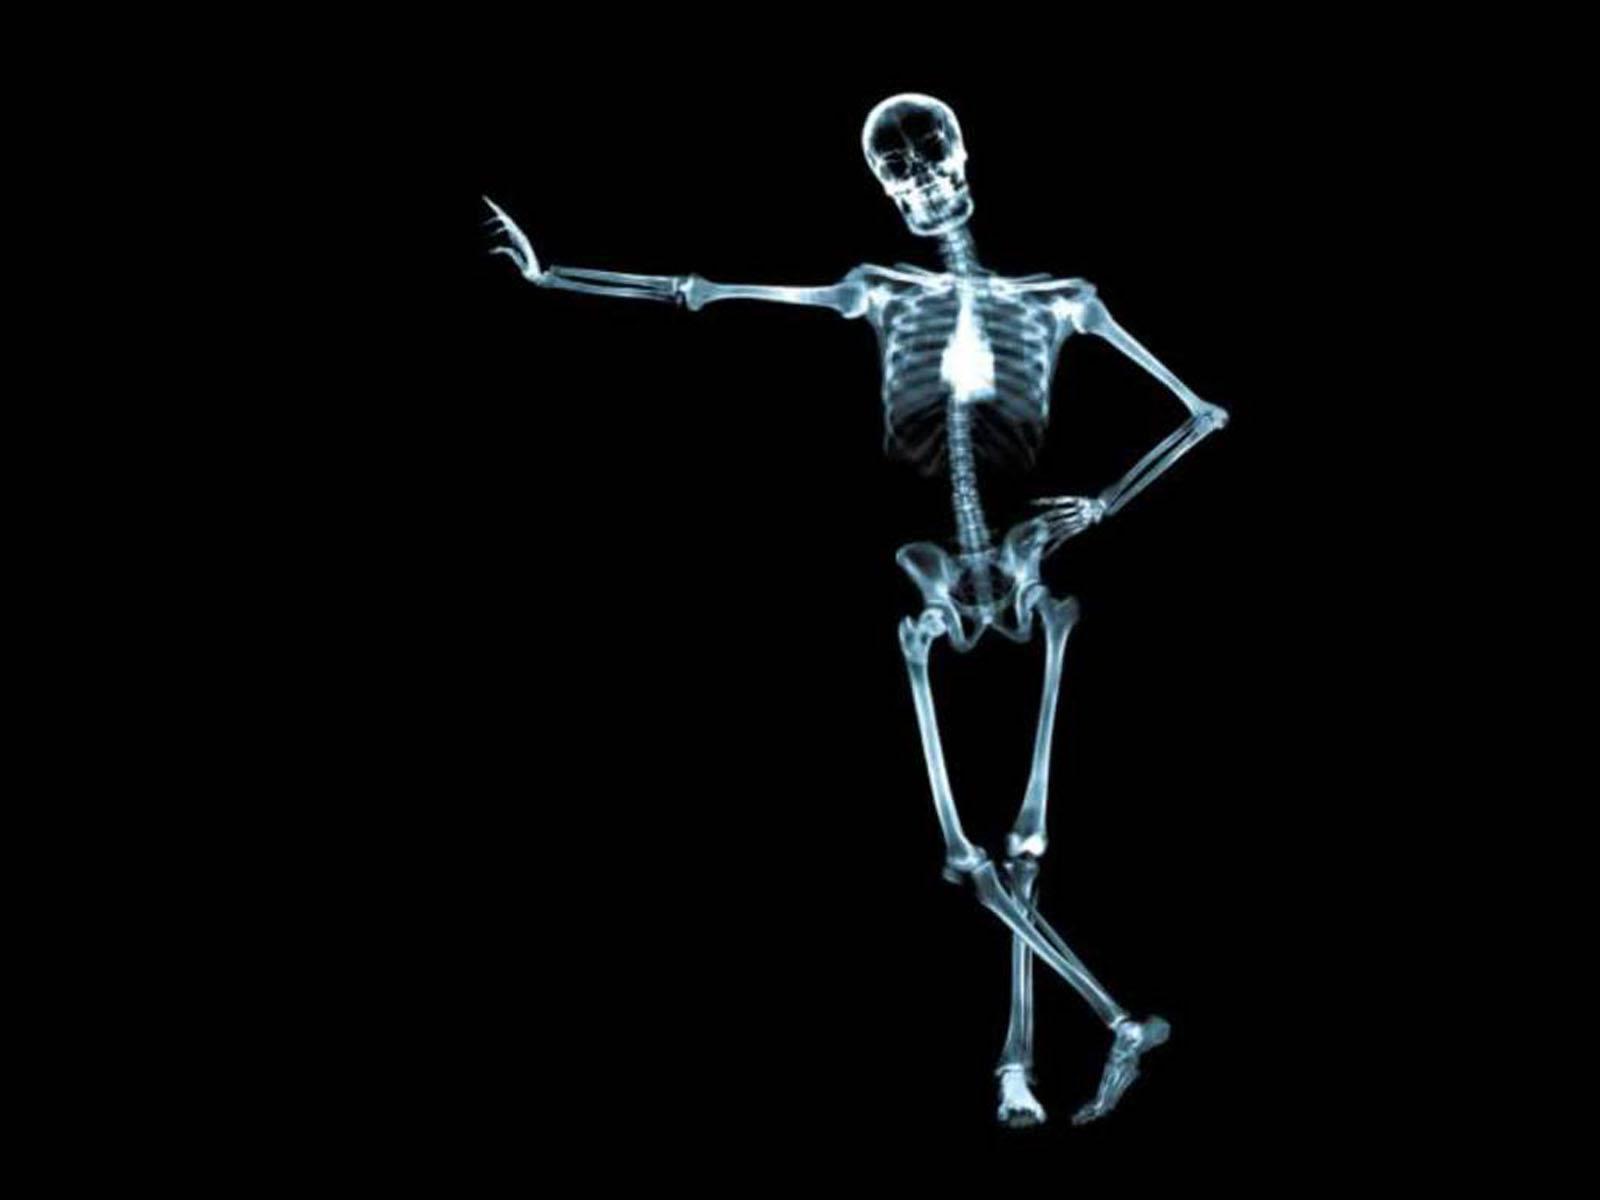 Wallpapers skeleton wallpapers - Skeleton wallpaper ...